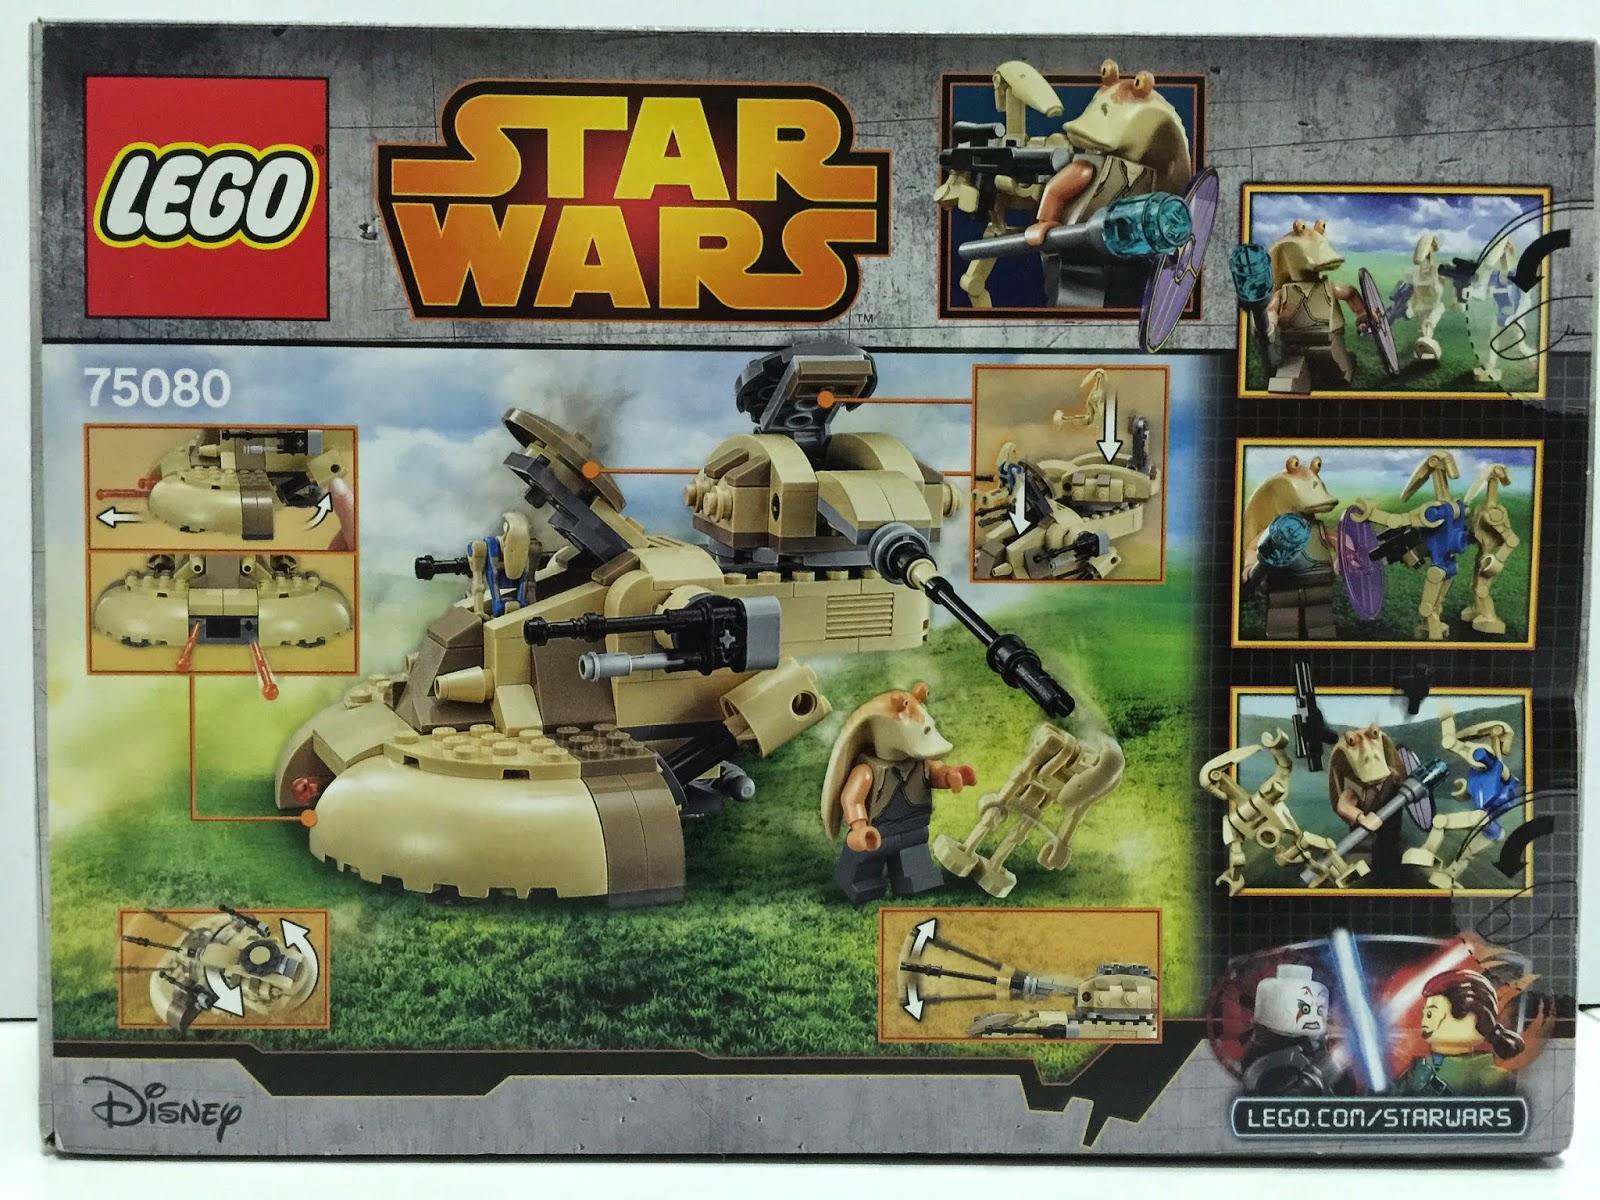 lego star wars aat 75080 instructions